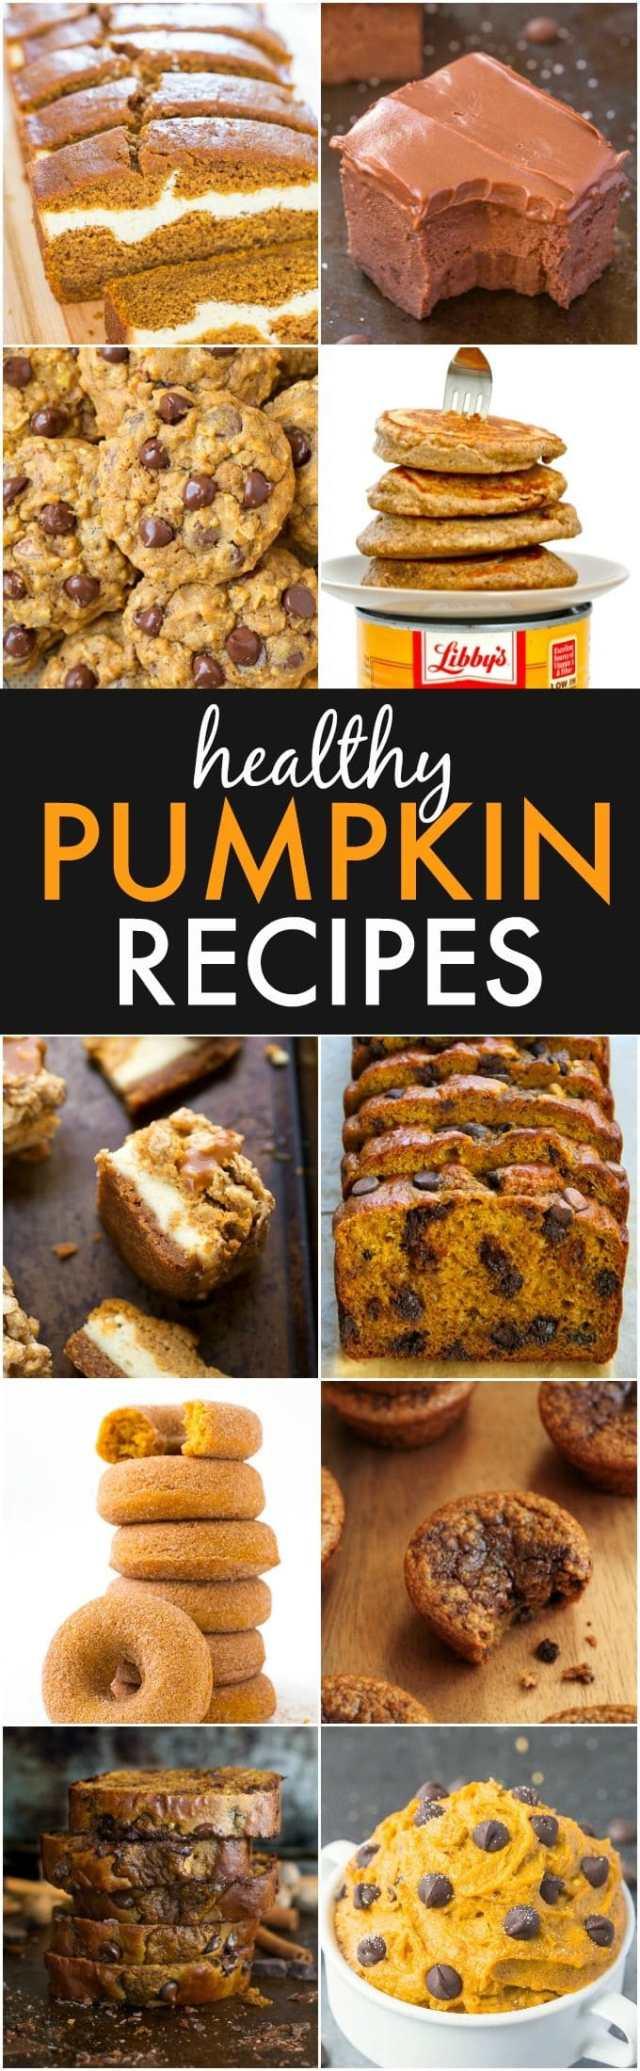 The BEST Healthy Pumpkin Recipes- Hands down, the BEST pumpkin recipes ever and ALL healthy recipes! {vegan, gluten free, sugar free, paleo recipe options}- thebigmansworld.com